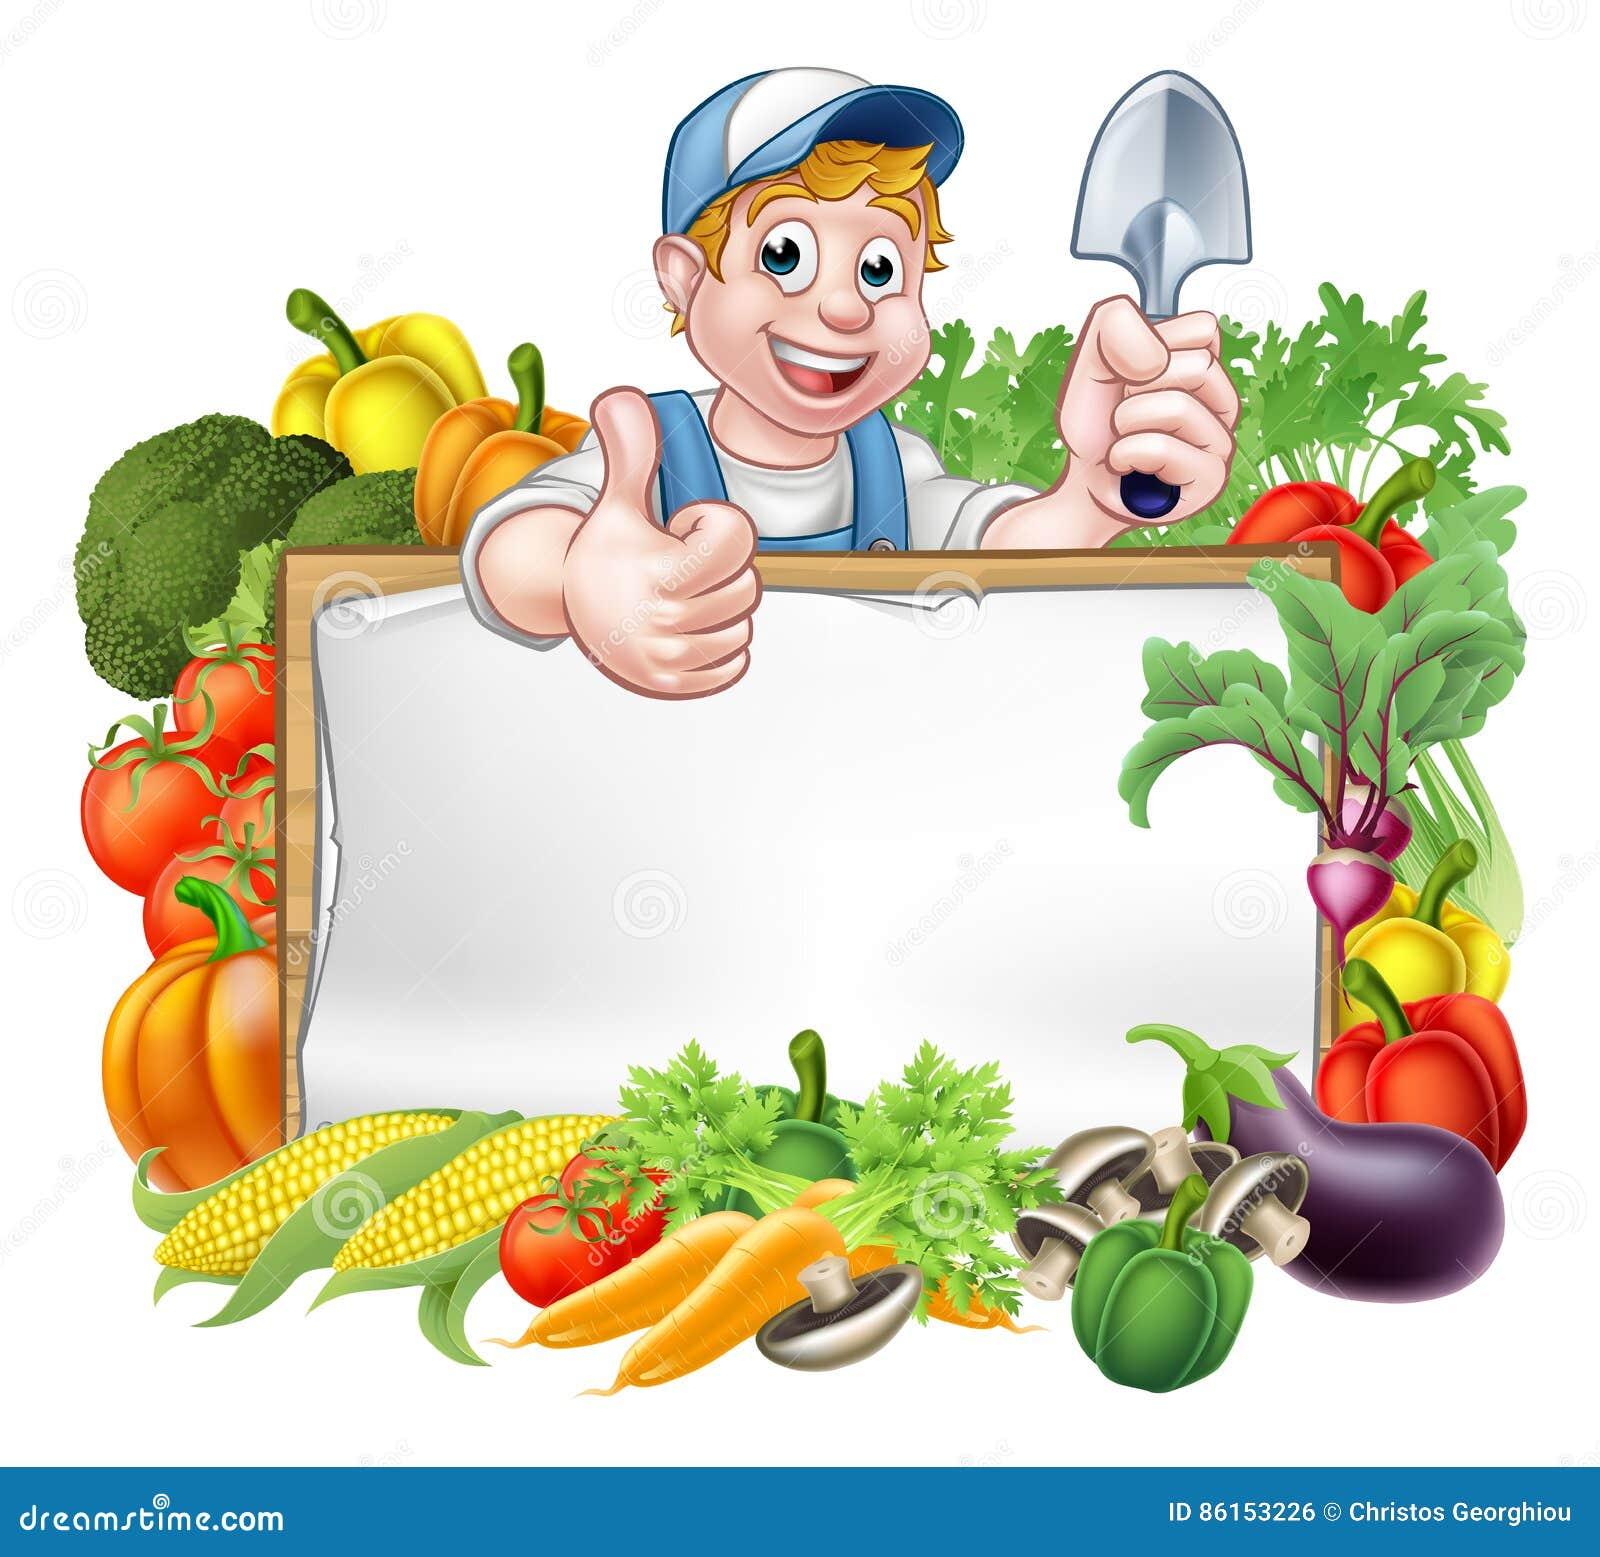 Cartoon gardener vegetables sign stock vector image for Les meilleurs sites de jardinage